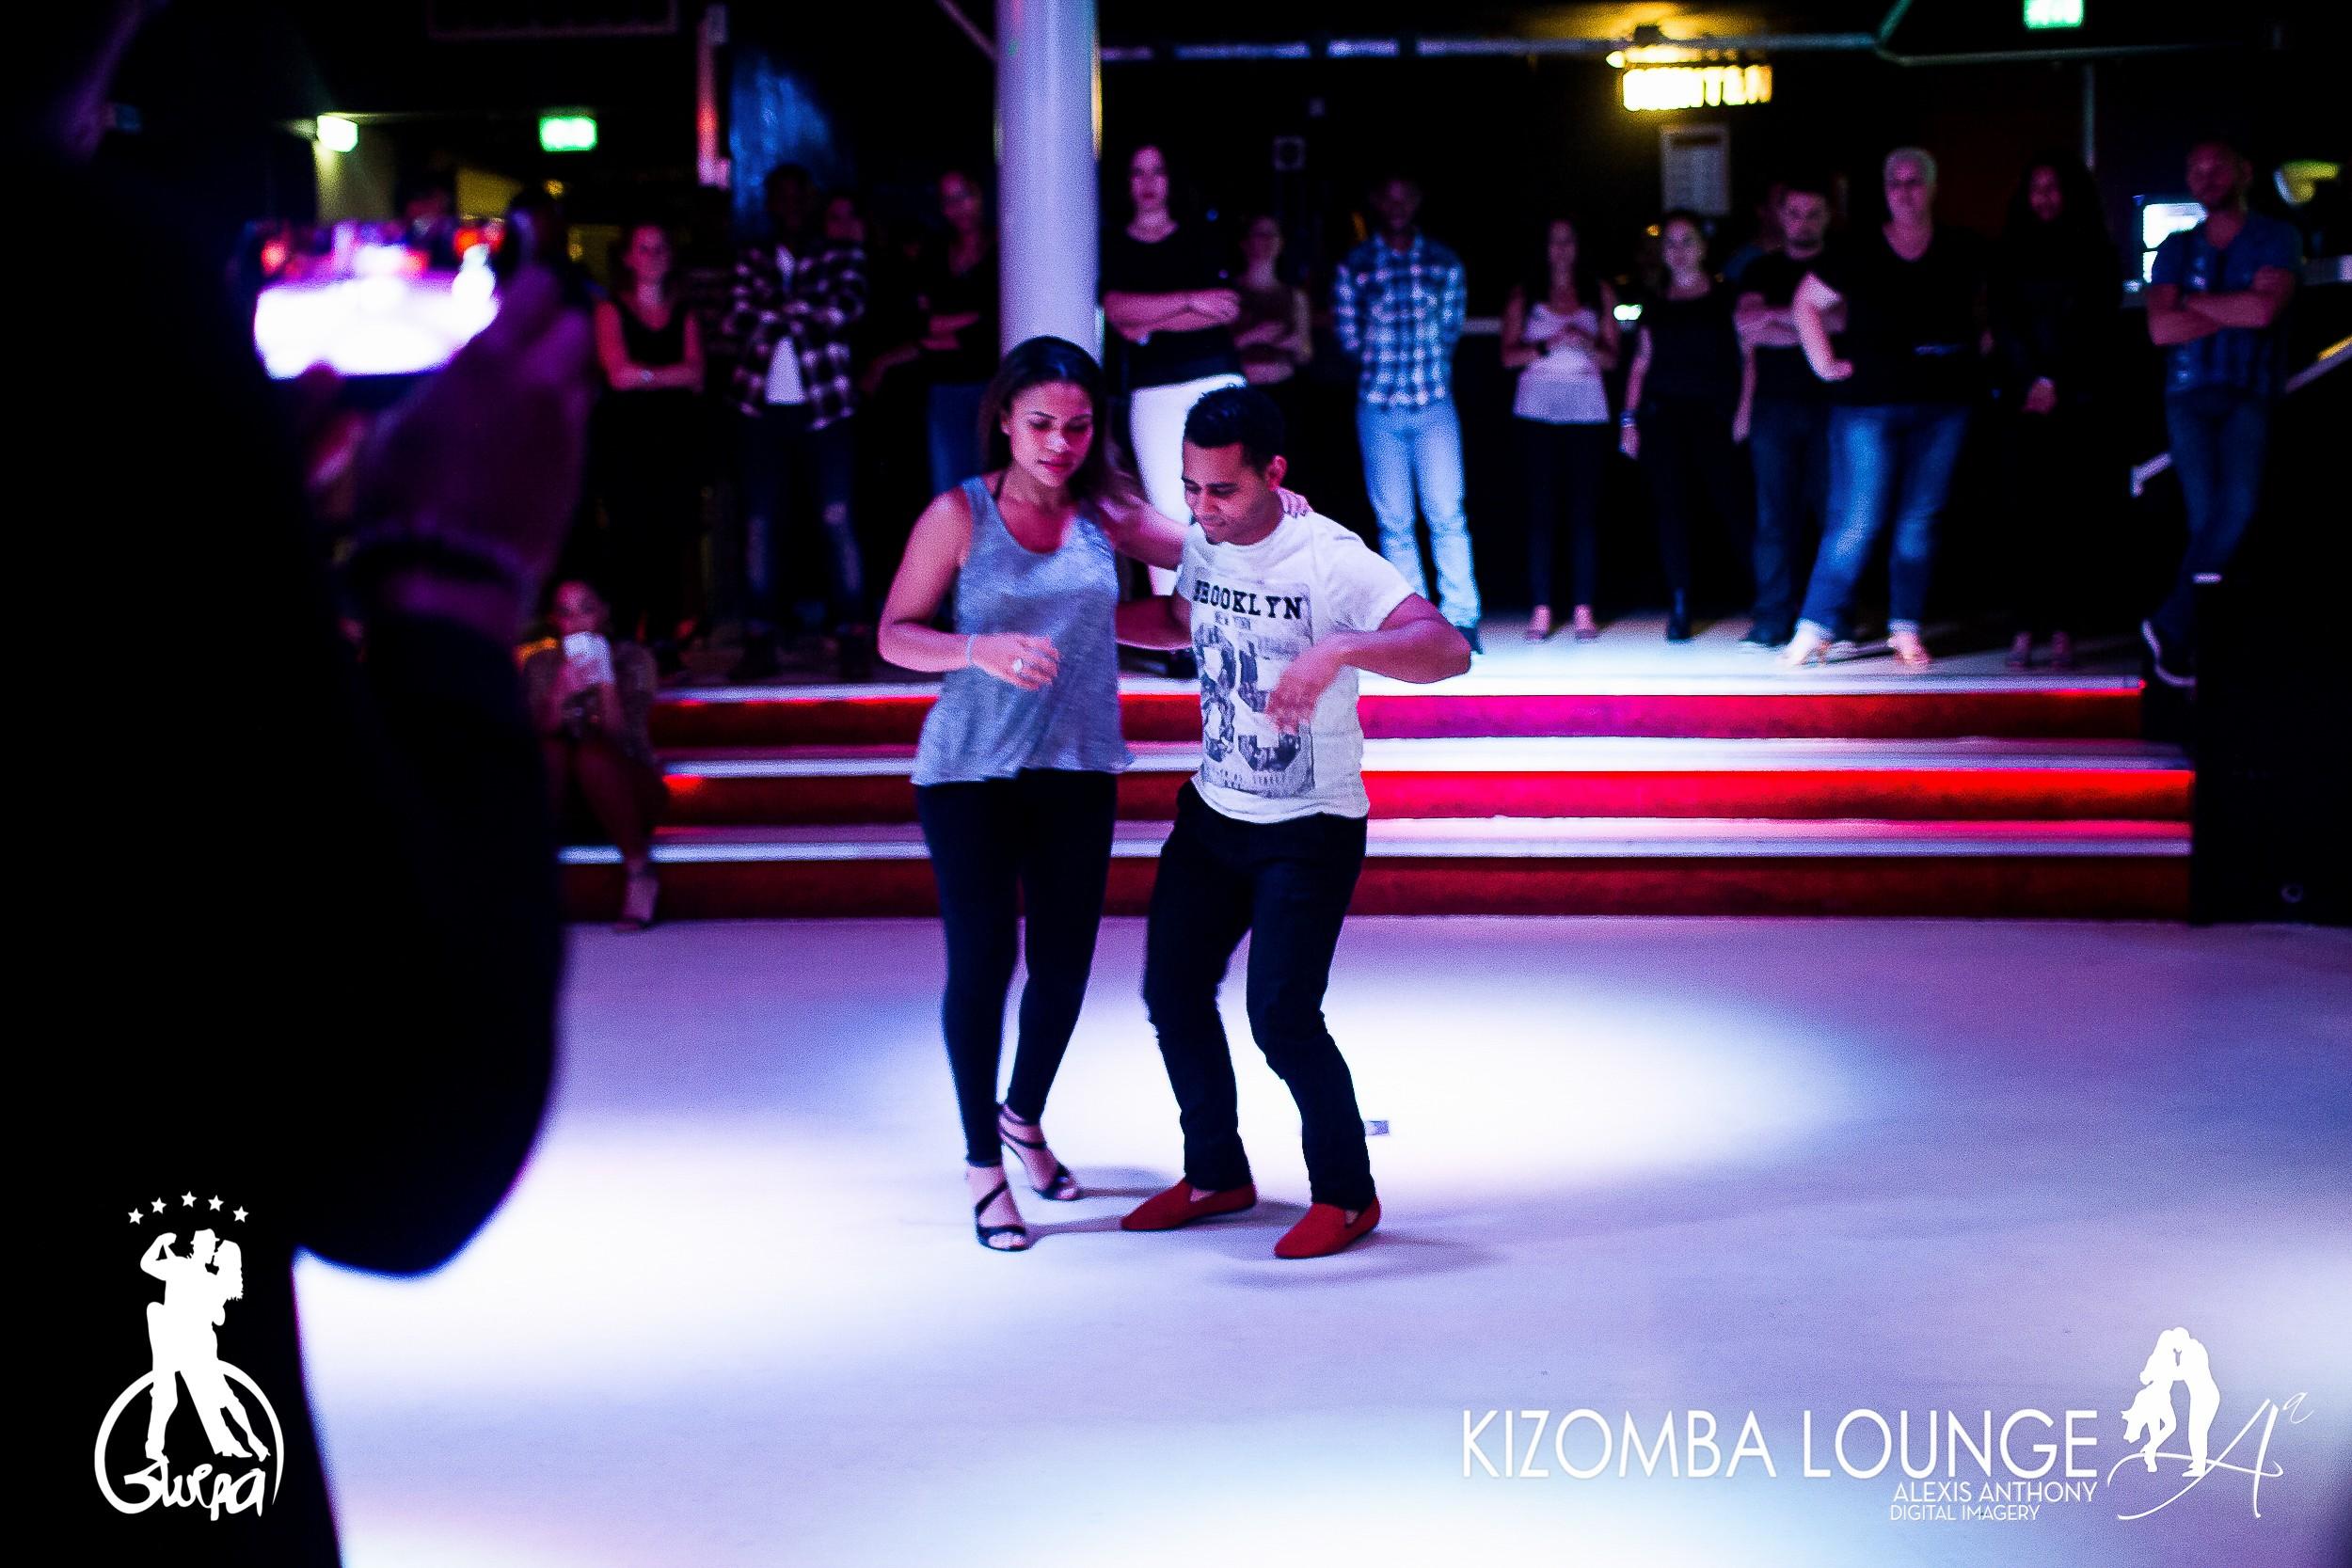 KizombaLounge.nl || photos by Alexis Anthony